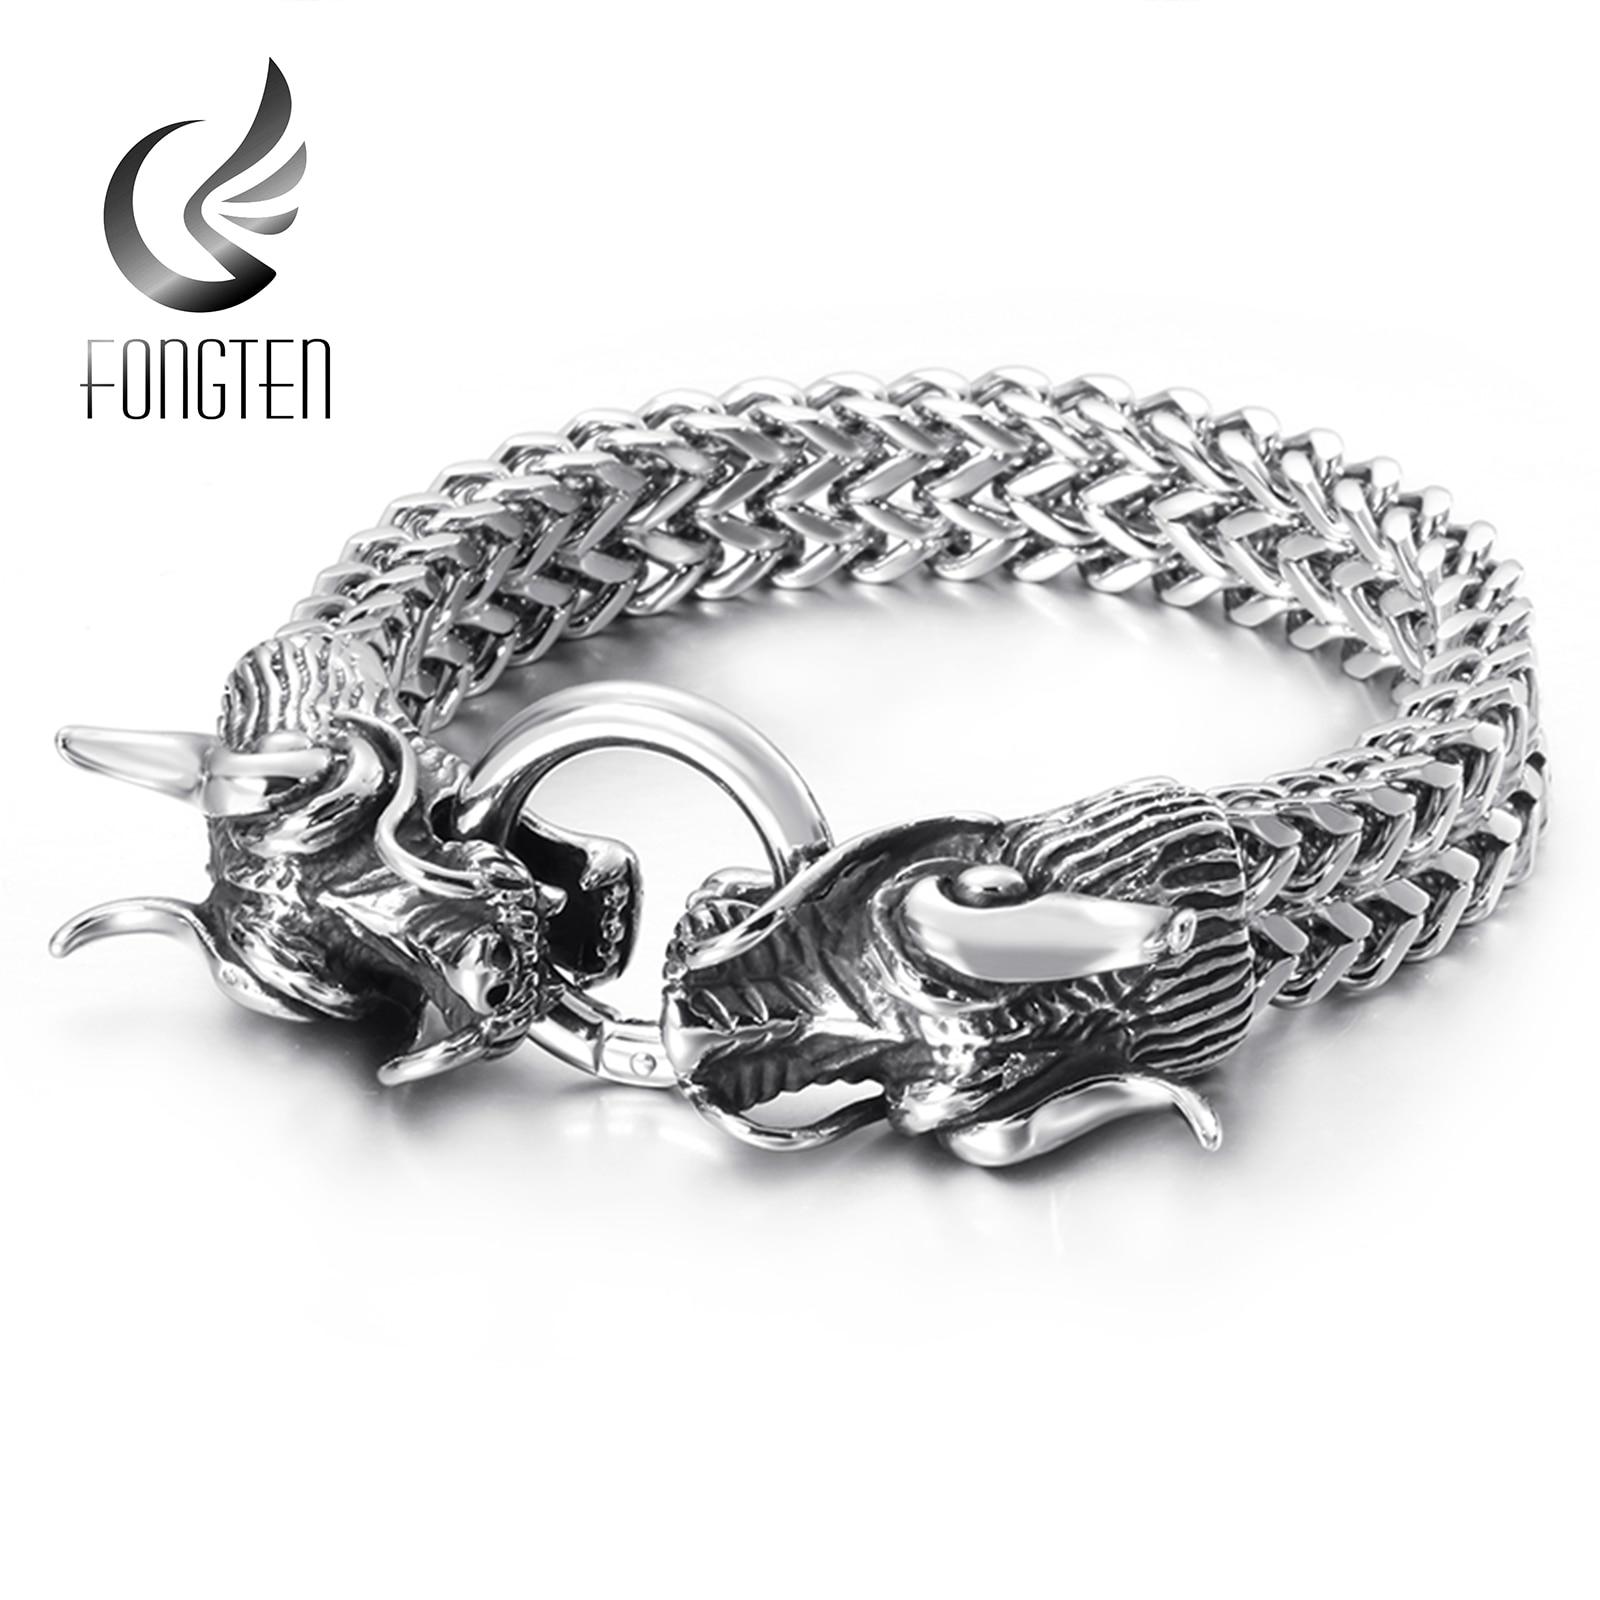 Men/'s Bracelets Punk Fashion Chinese Dragon Bracelet Stainless Steel Jewelry New